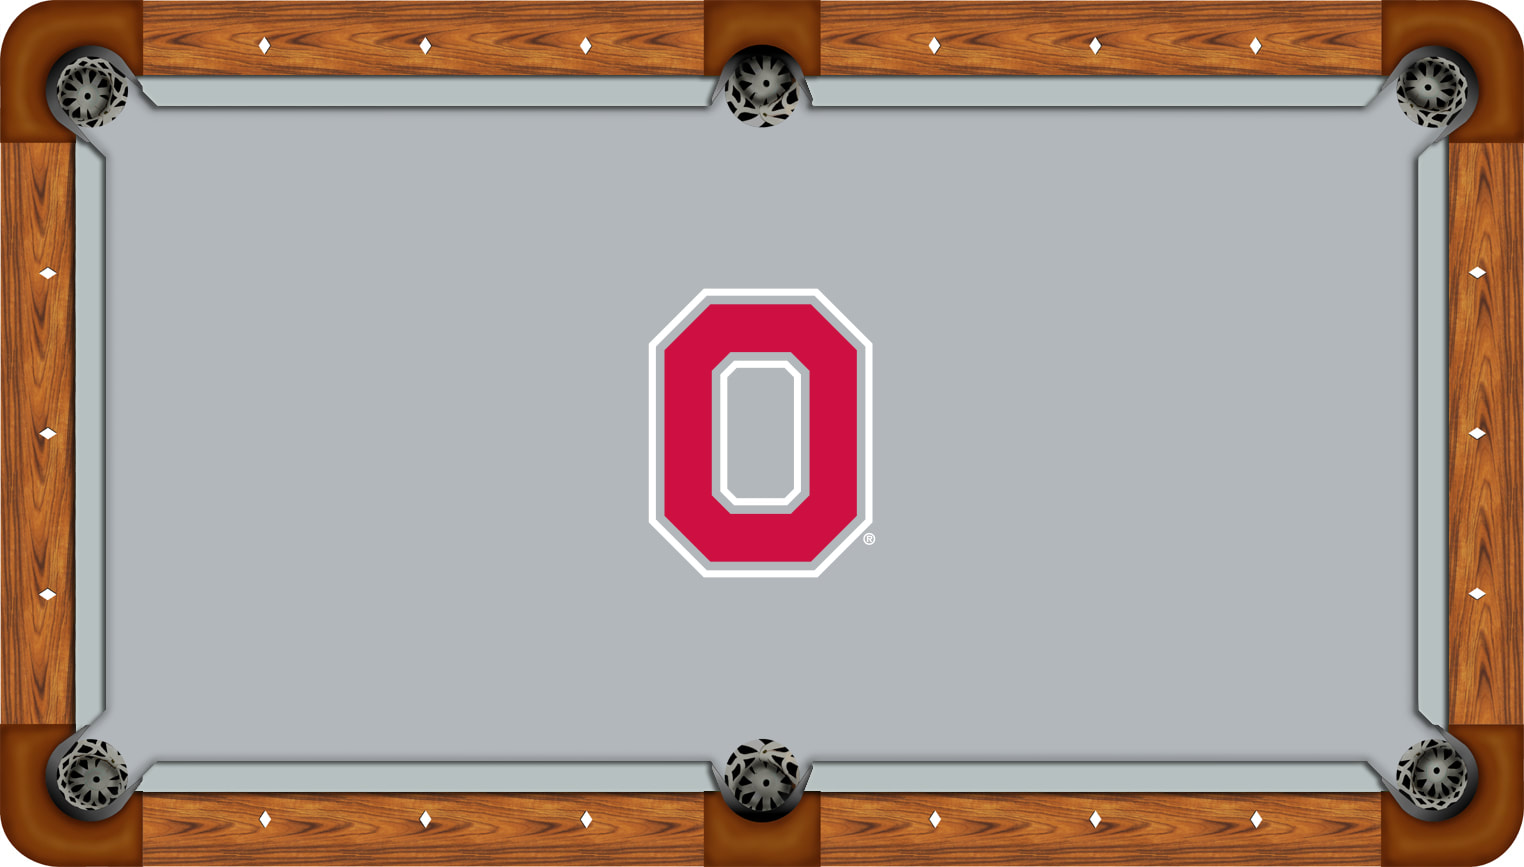 Ohio State Billiard Table Cloth